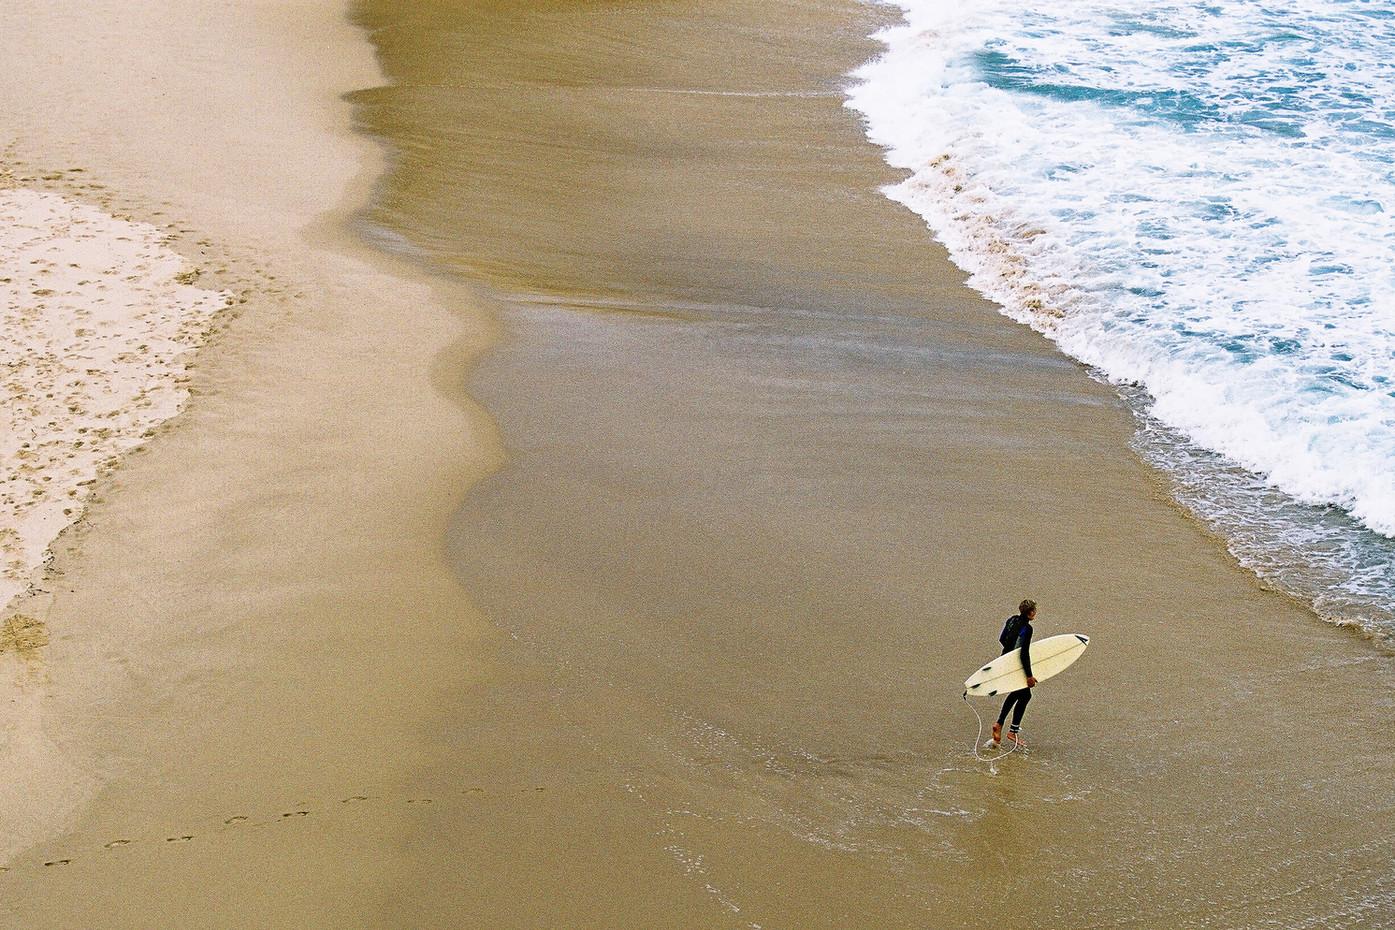 Surfer at Tamarama beach in Sydney, Australia